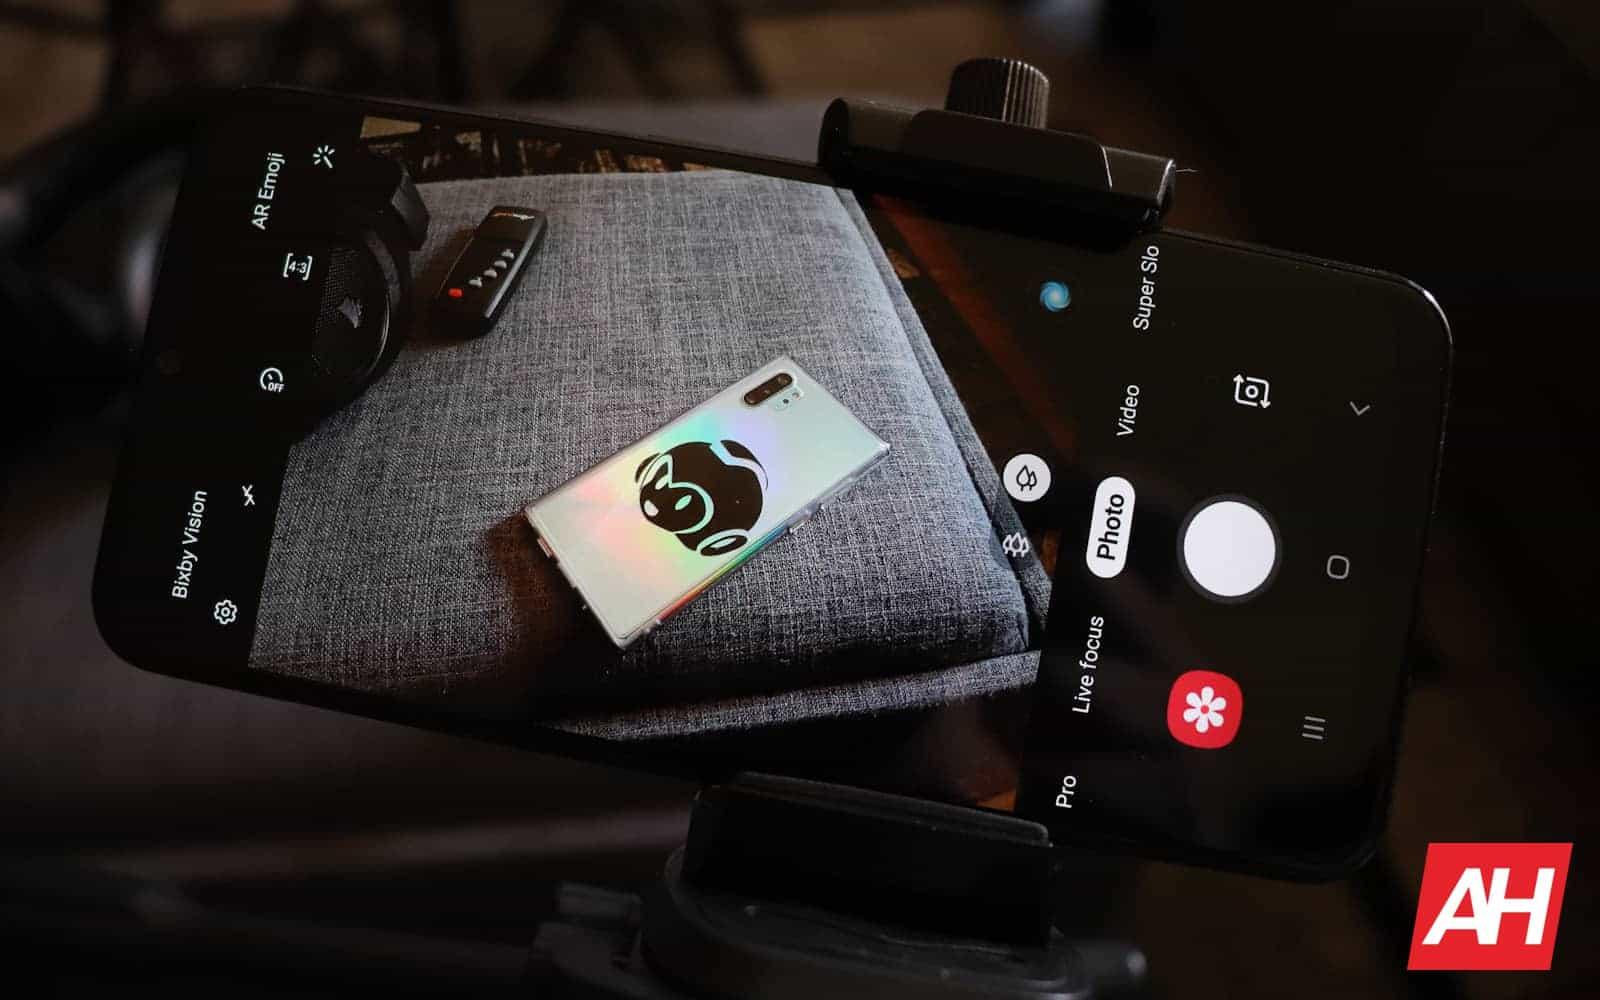 Samsung Galaxy A50 Review 05 camera AH 2019